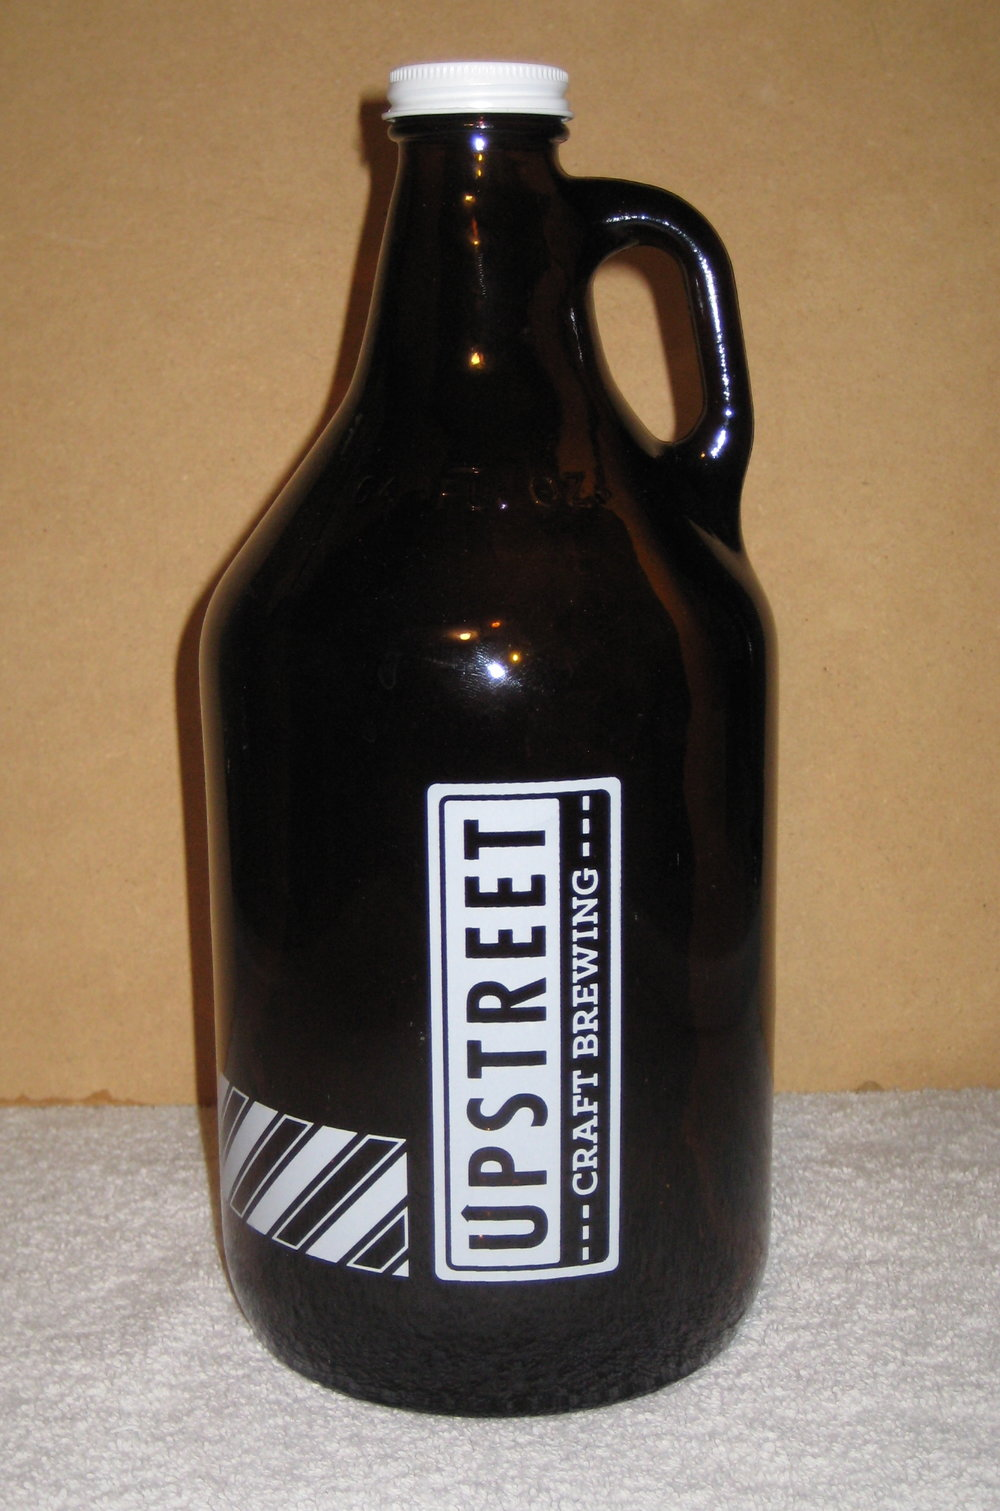 Upstreet Brewing (PEI)